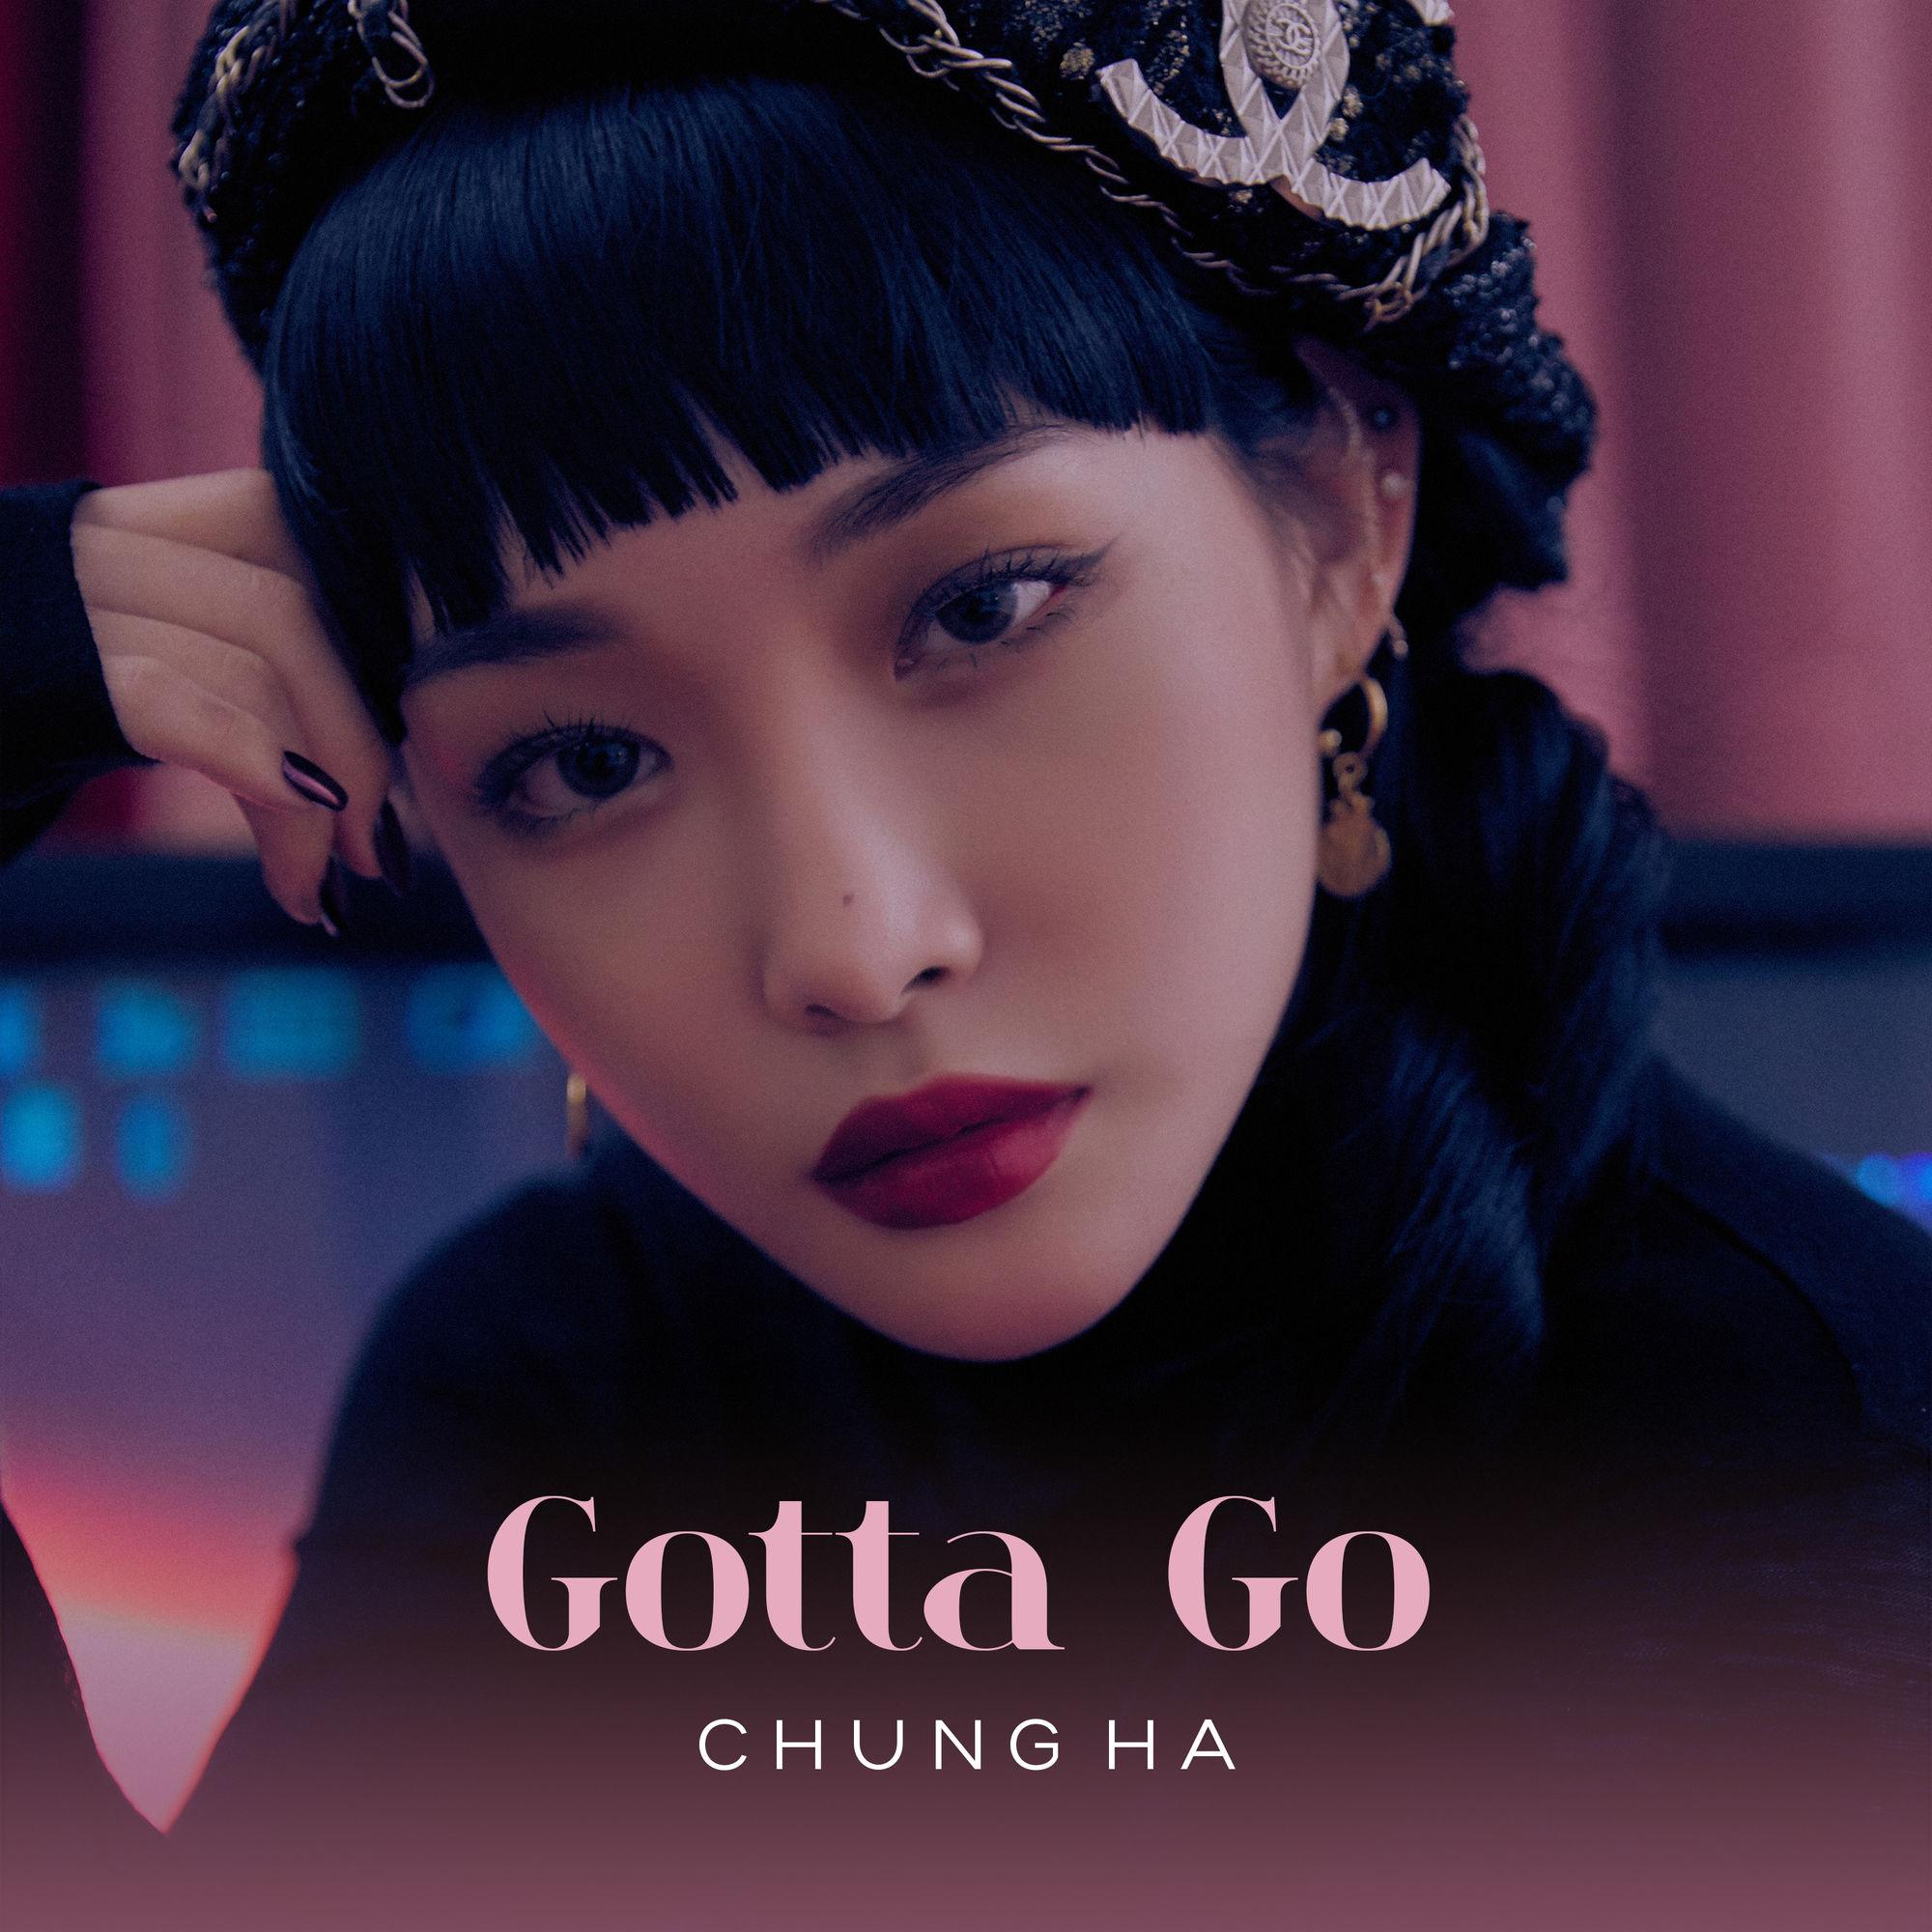 CHUNG HA - Gotta Go – Single [iTunes Plus]